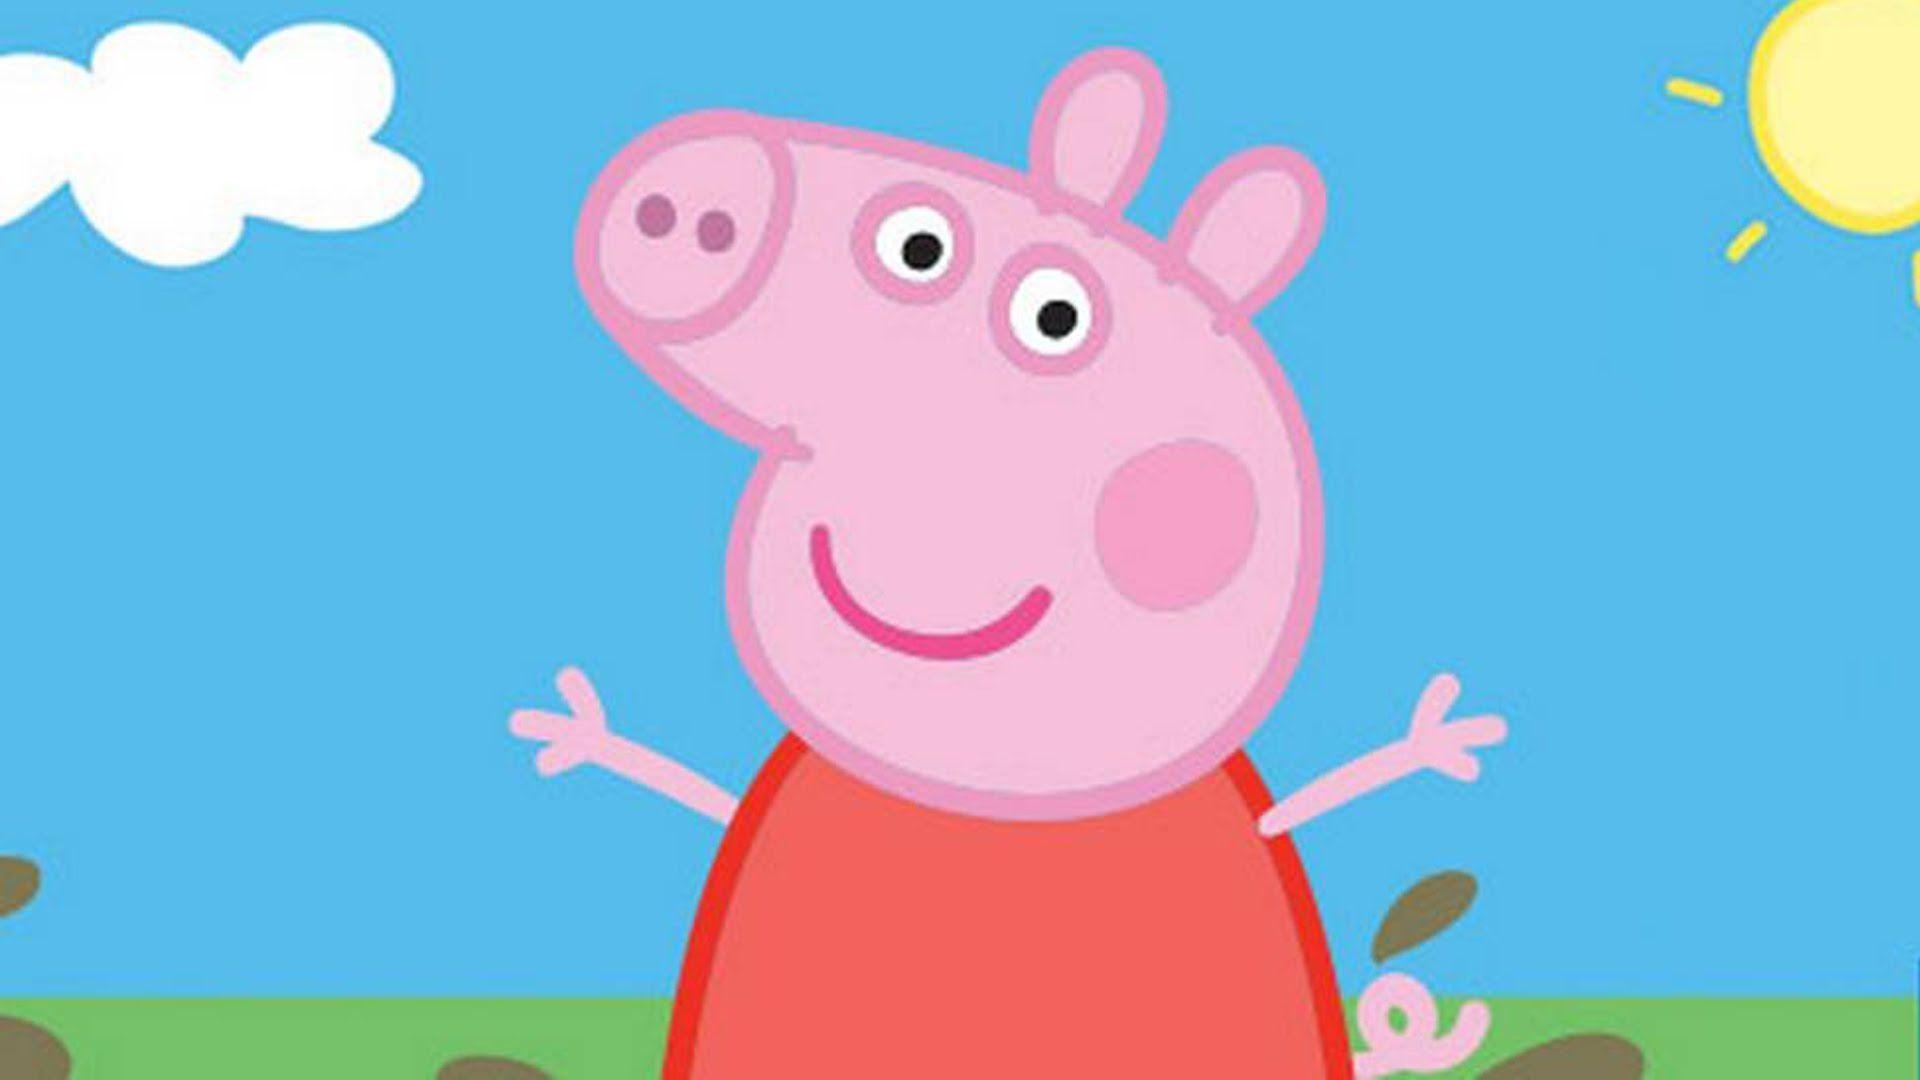 1920x1080 Peppa Pig Wallpapers Group Data Id 225969   Peppa Pig 1920x1080